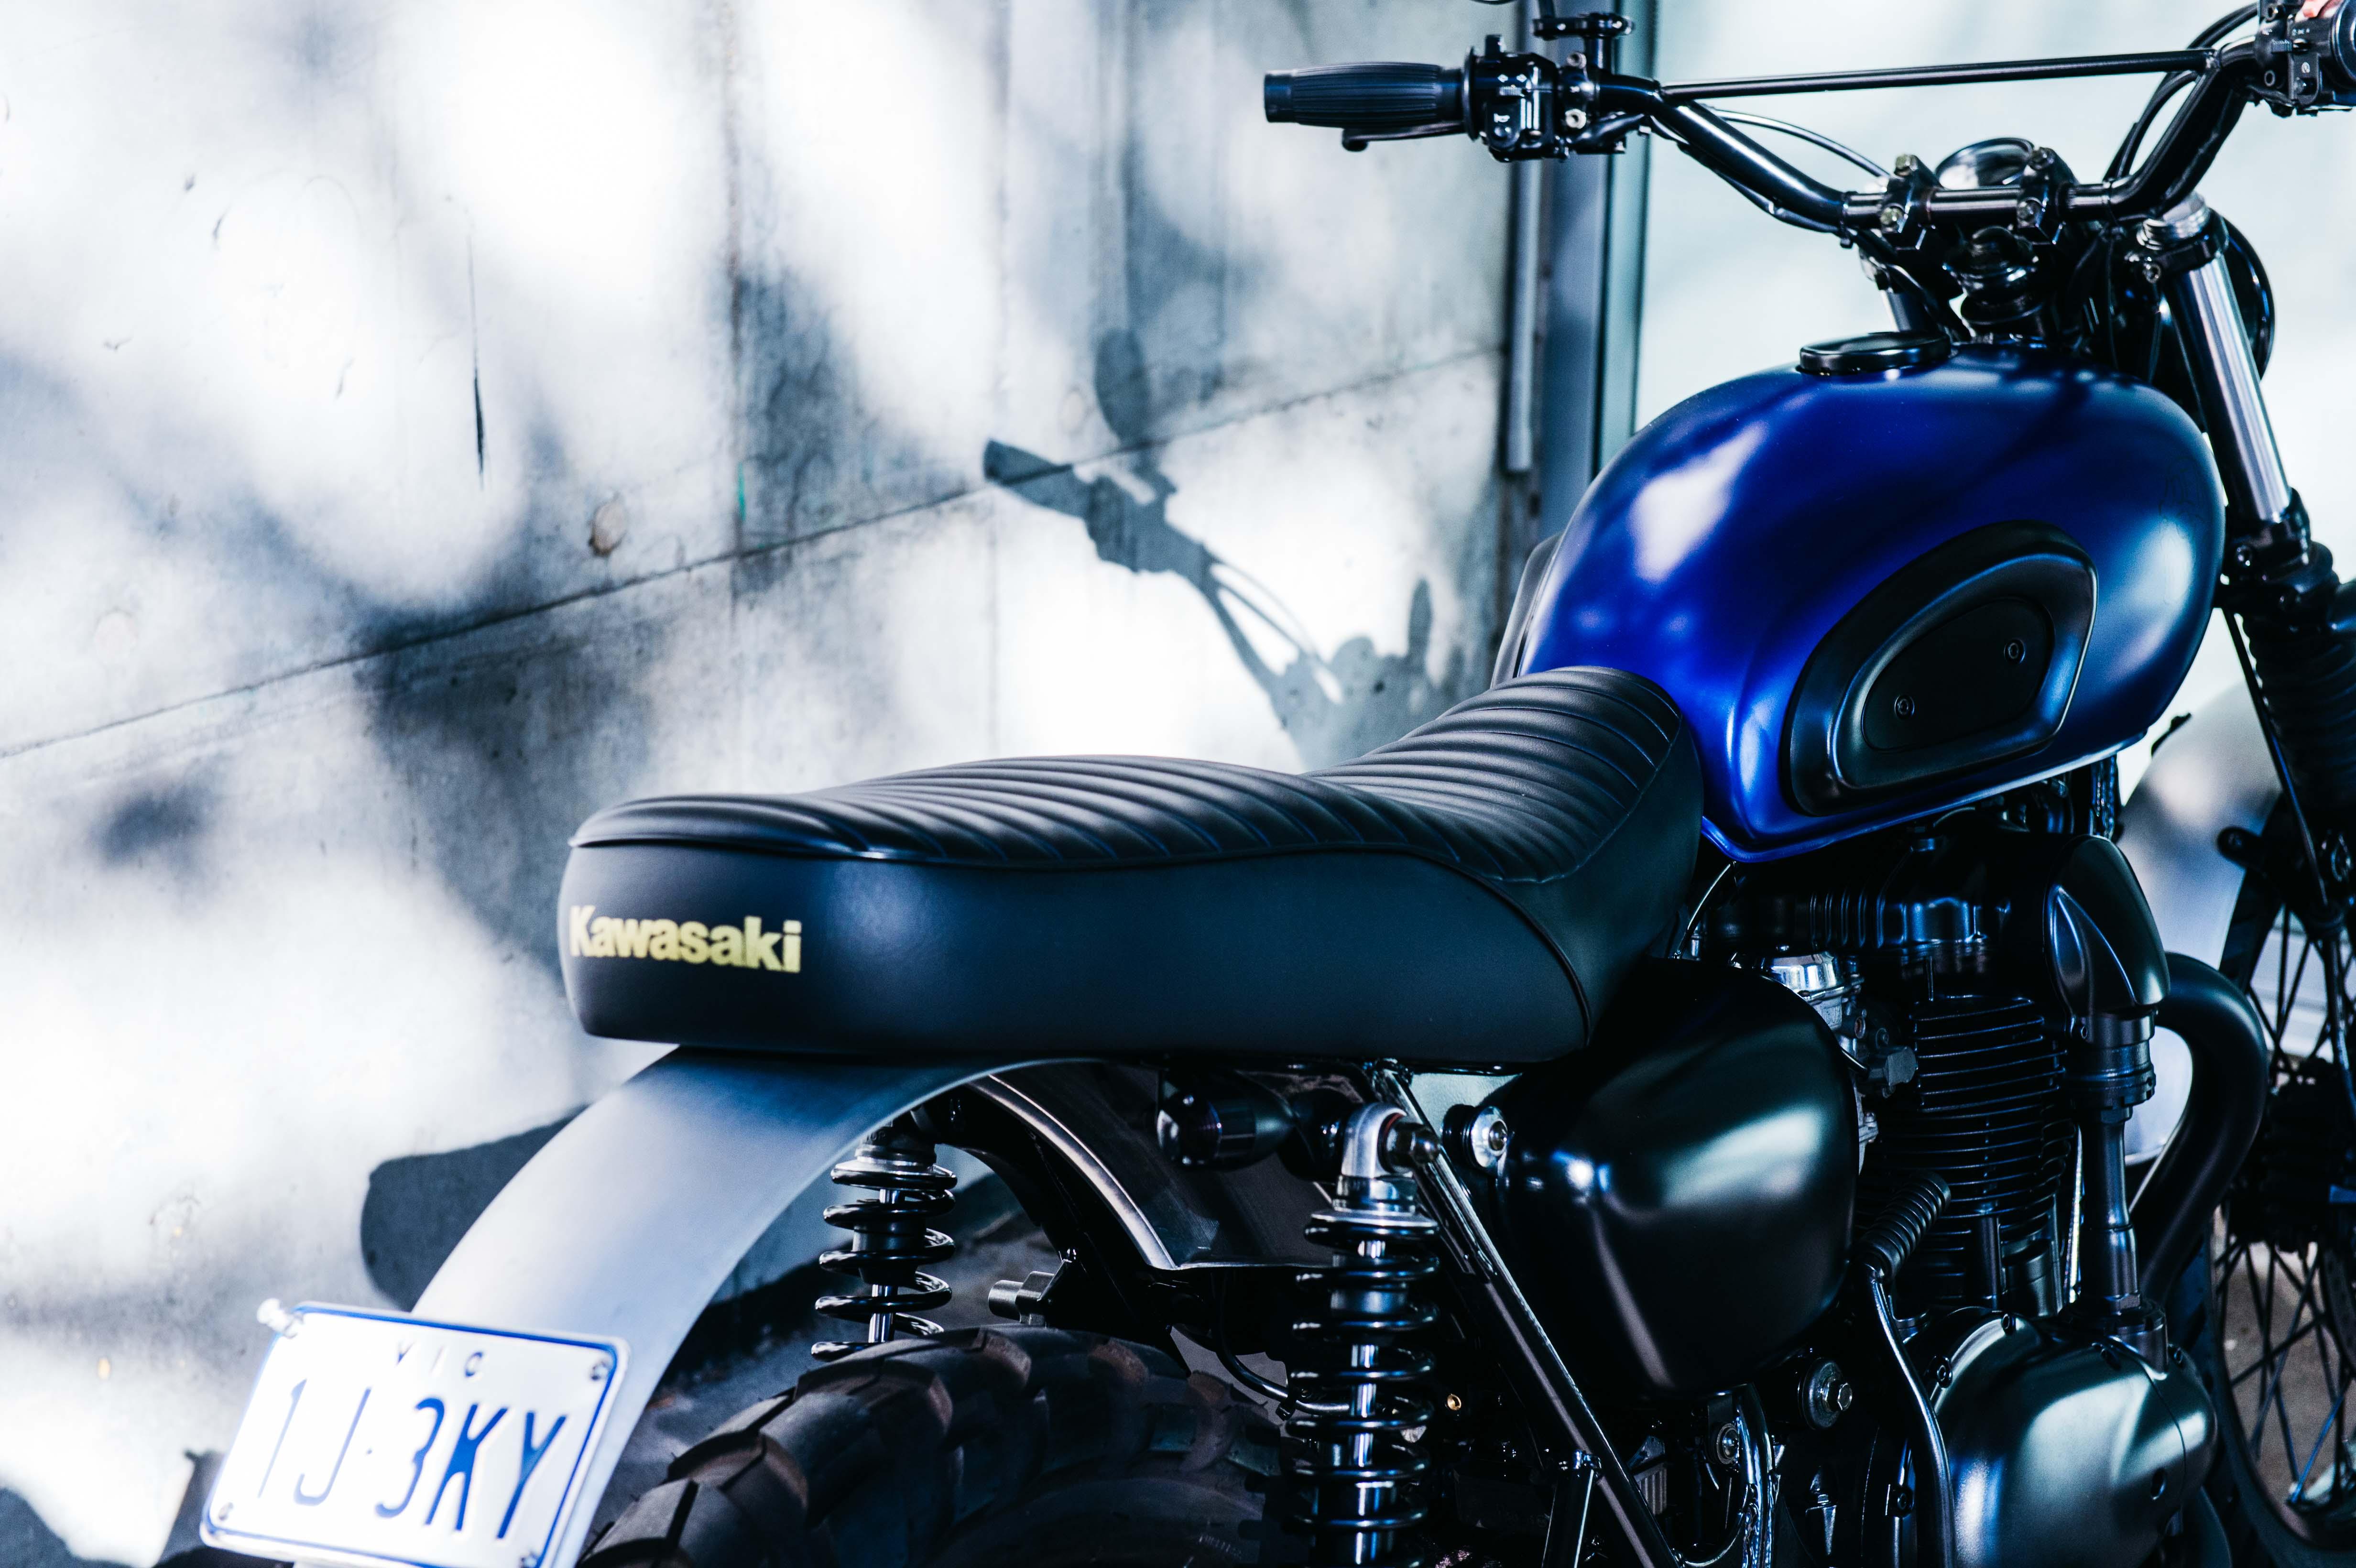 Midnight Rambler W650 Deus Ex Machinadeus Ex Machina